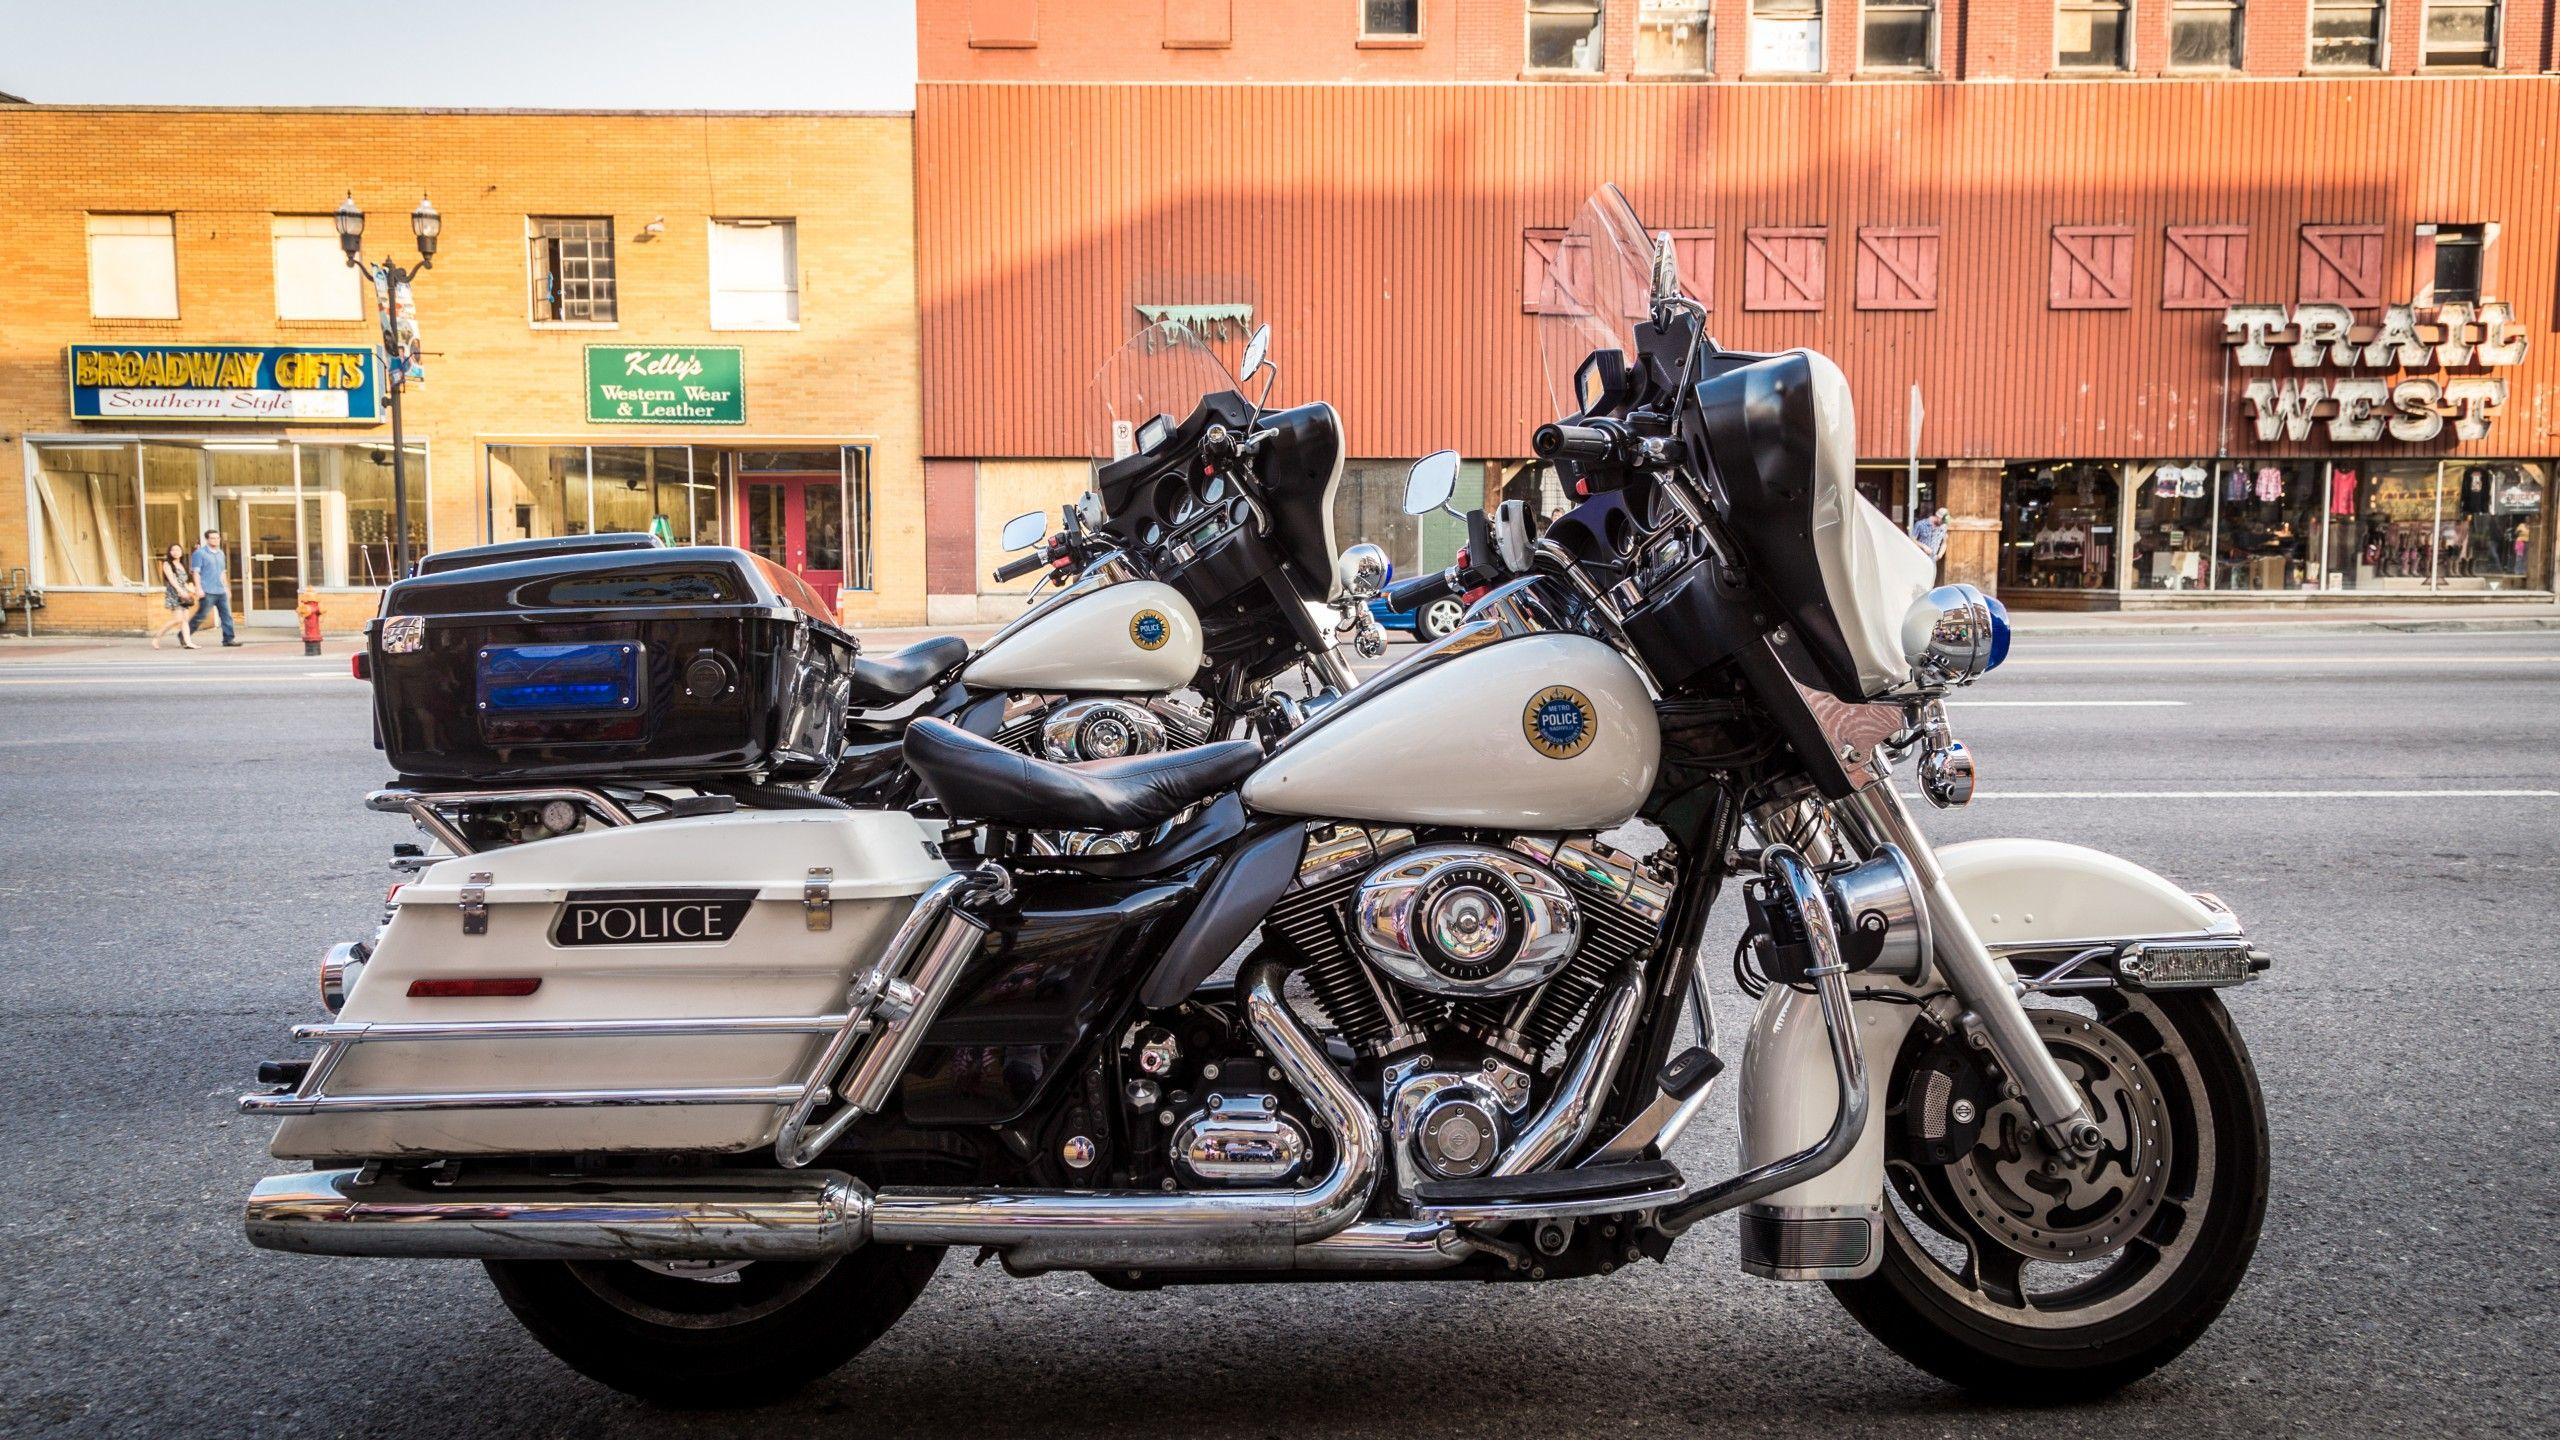 Police Motorcycles Harley Davidson Highway Patrol